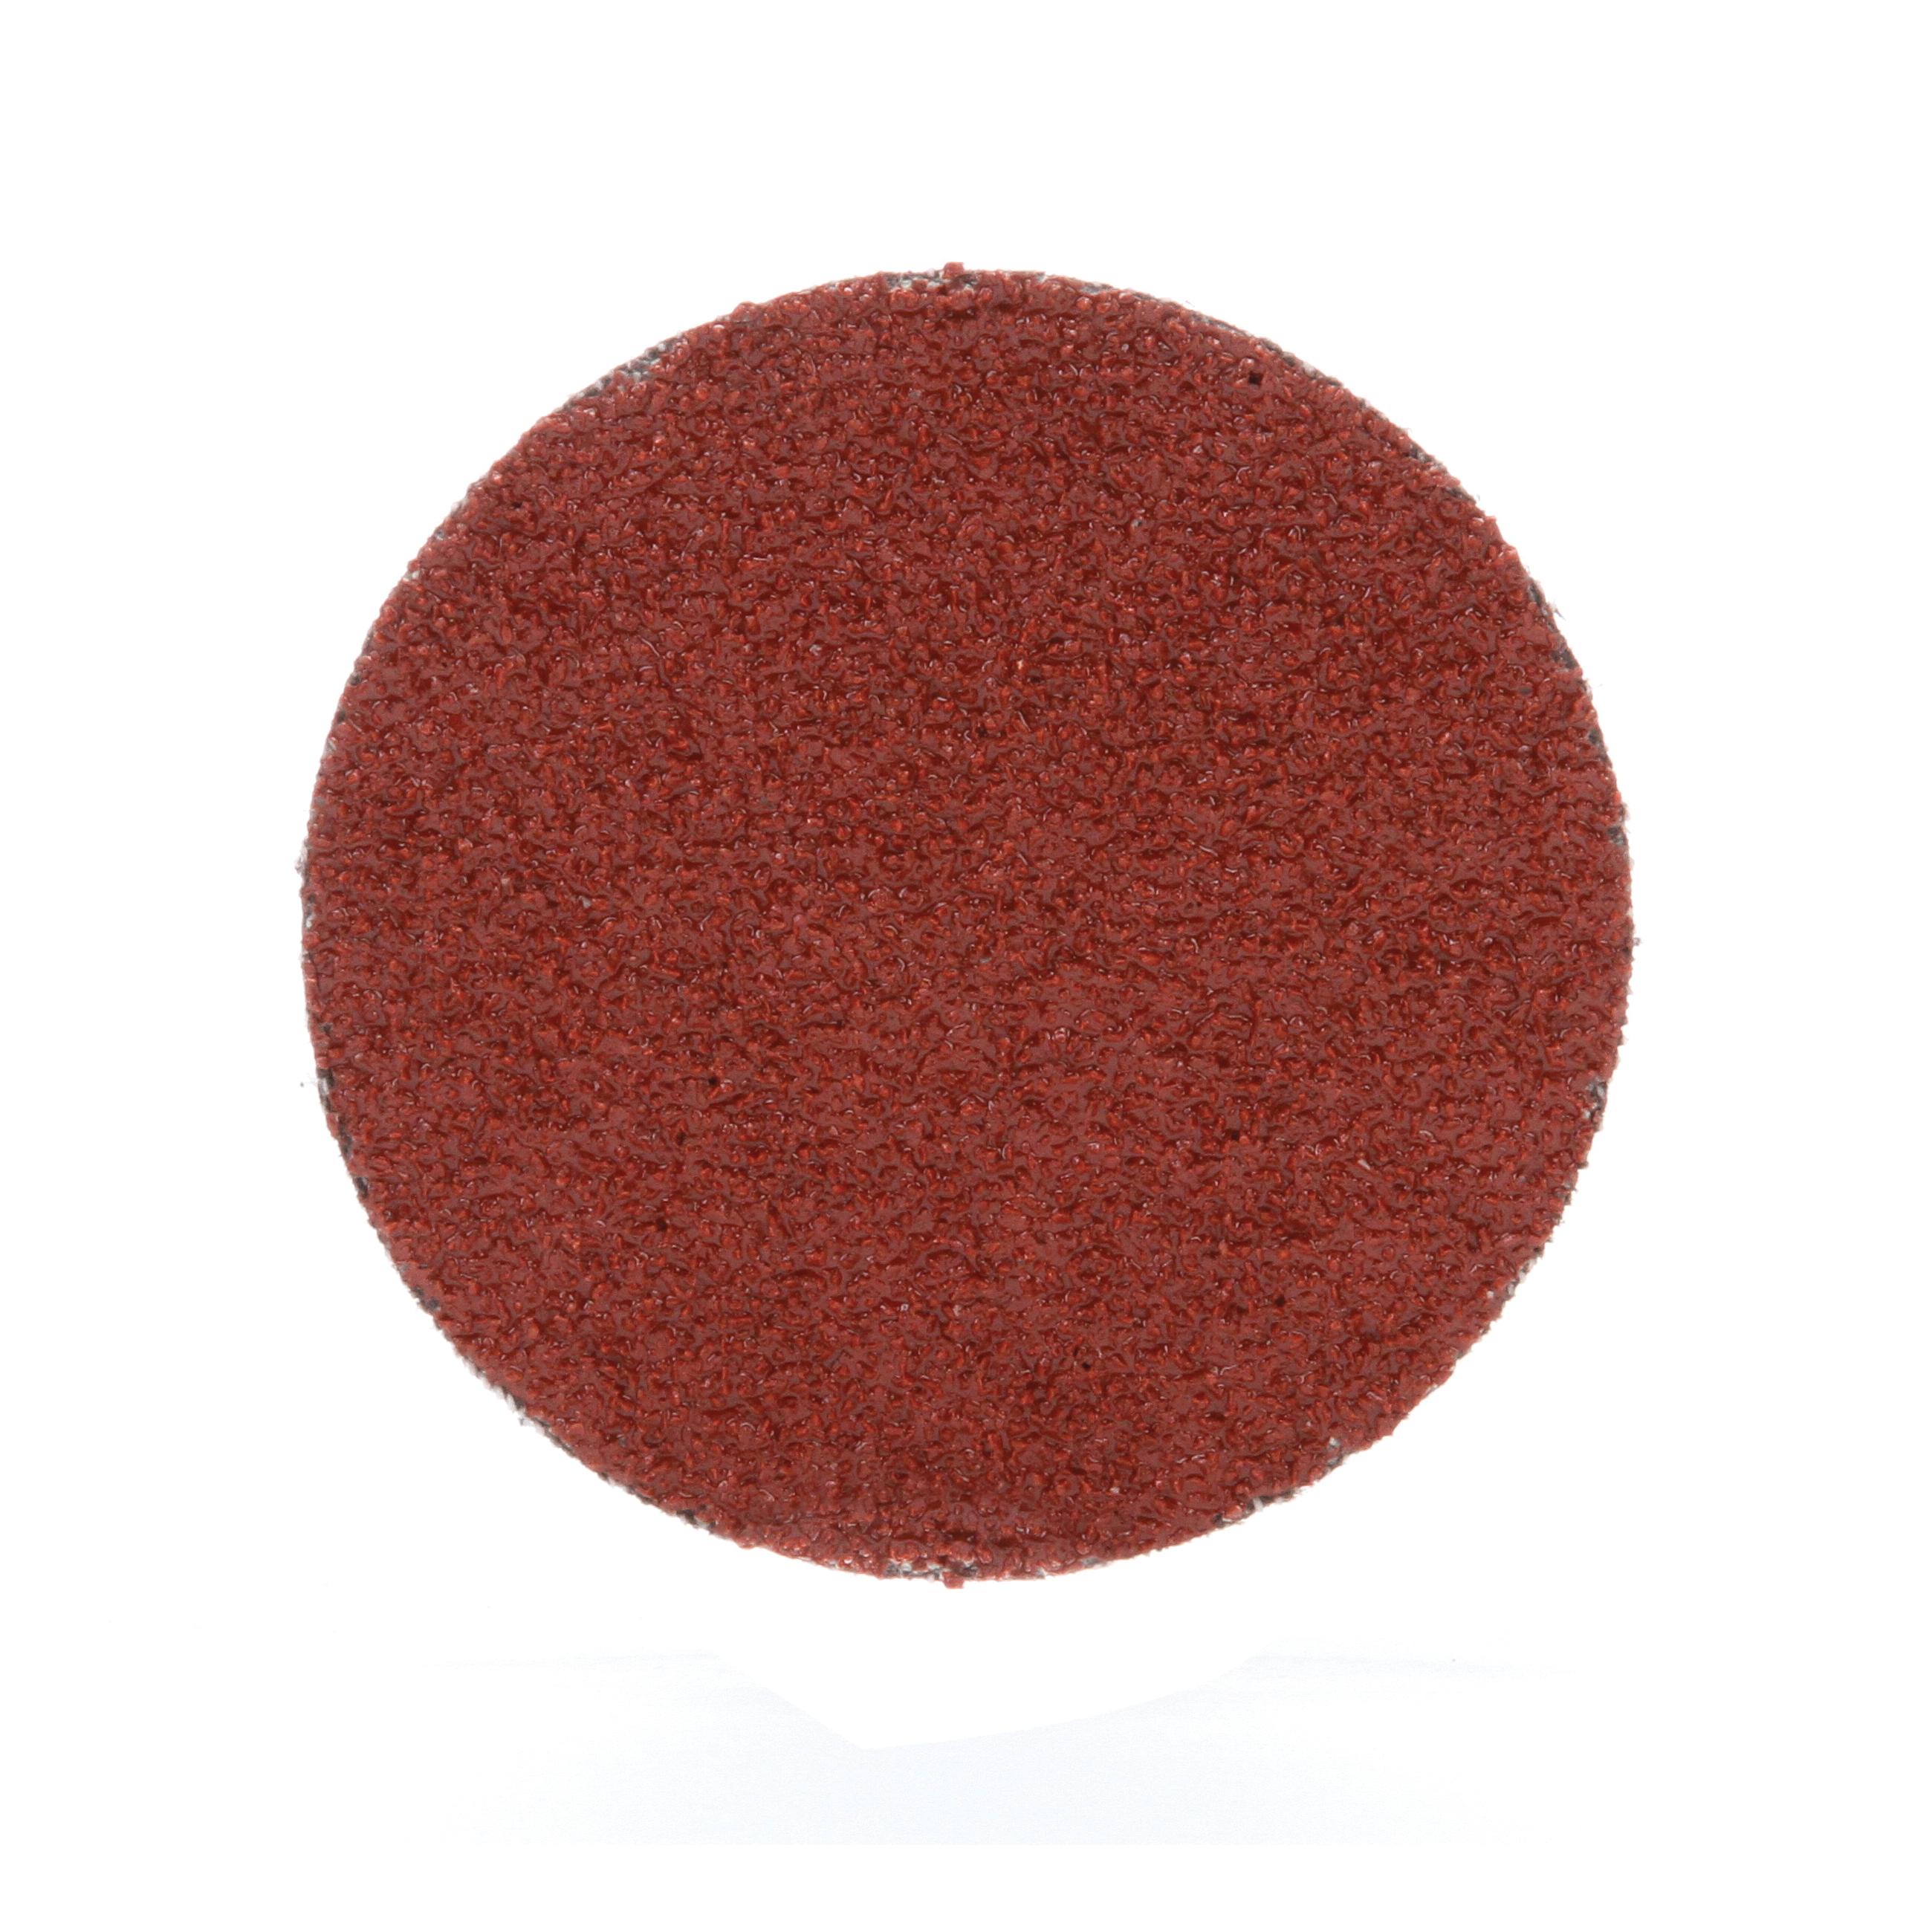 Roloc™ 051144-11104 963G Close Close Coated Abrasive Disc, 3 in Dia Disc, 50 Grit, Coarse Grade, Ceramic Abrasive, Type TR Attachment